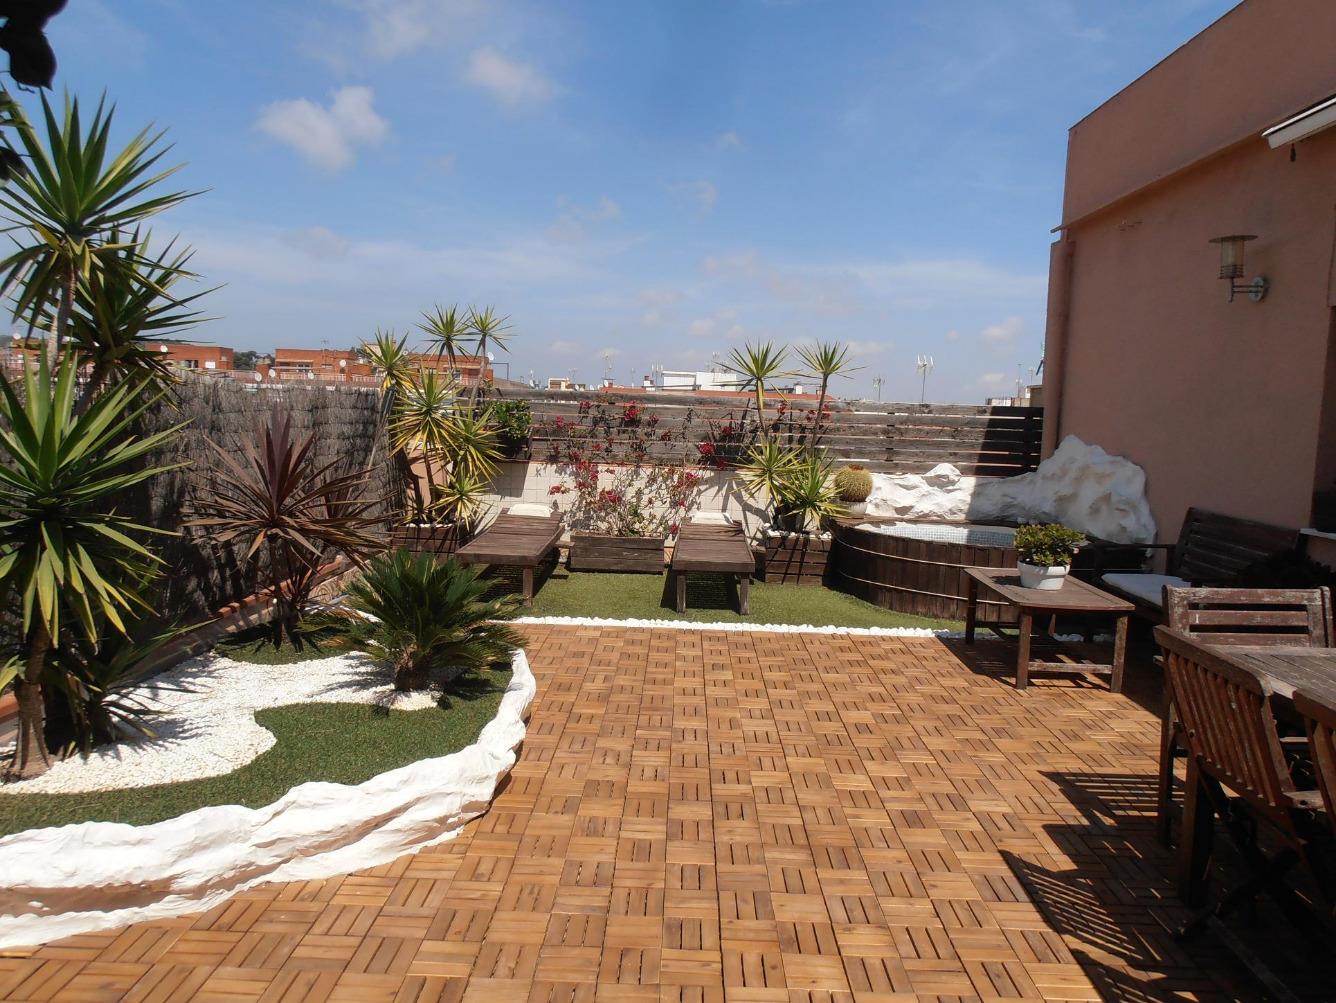 Dise a tu terraza paso a paso for Baldosas para el jardin